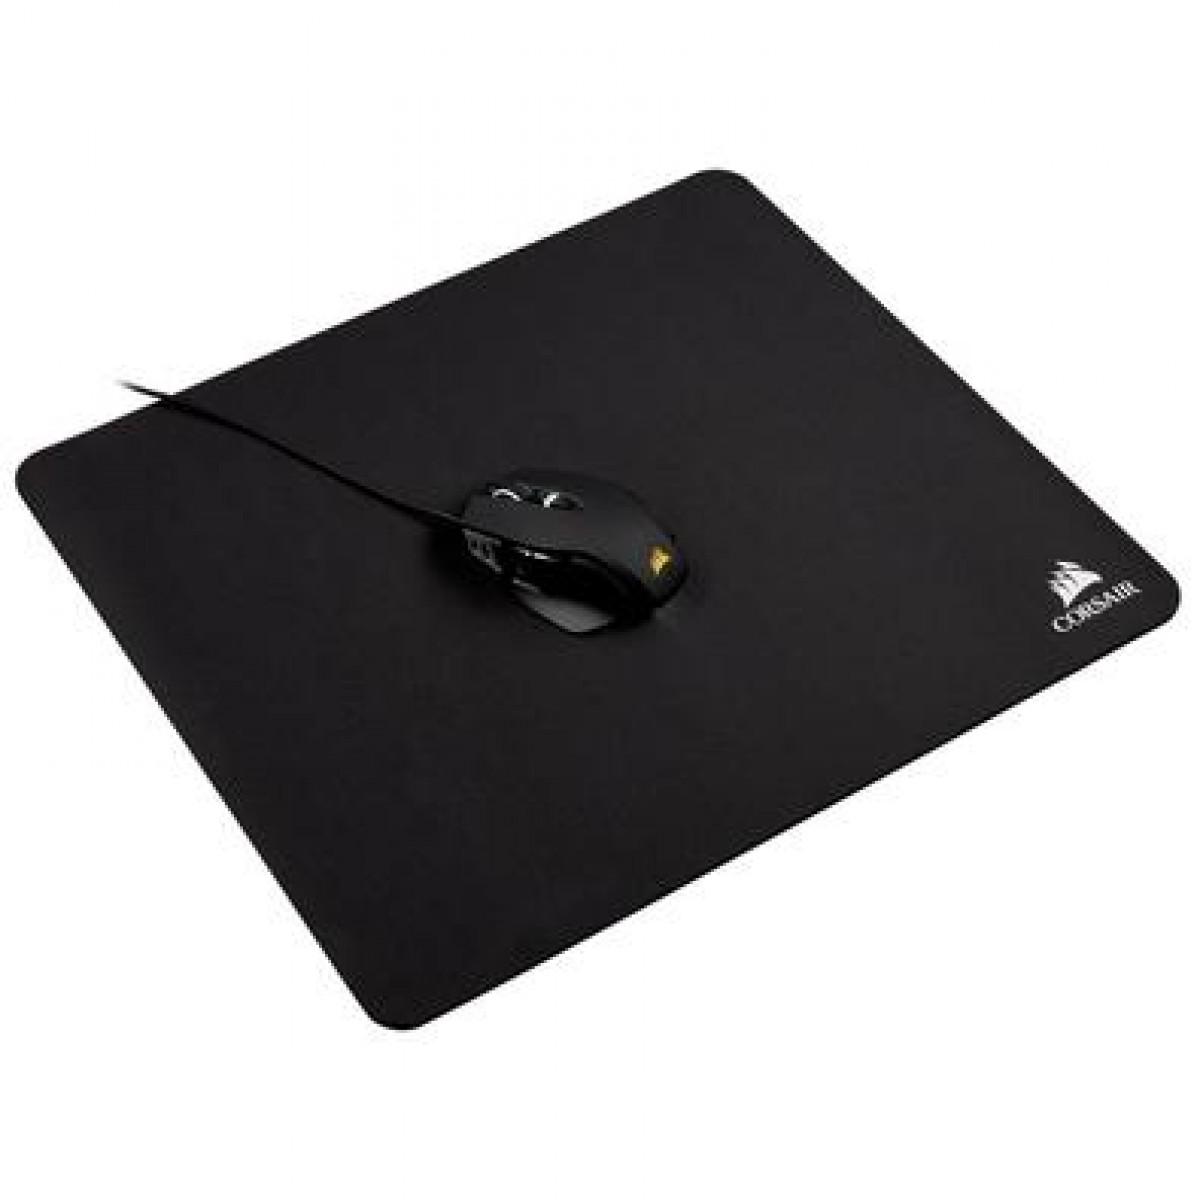 Mousepad Gamer Corsair MM250 Champion Series, 450mm x 400mm, Black, CH-9412560-WW